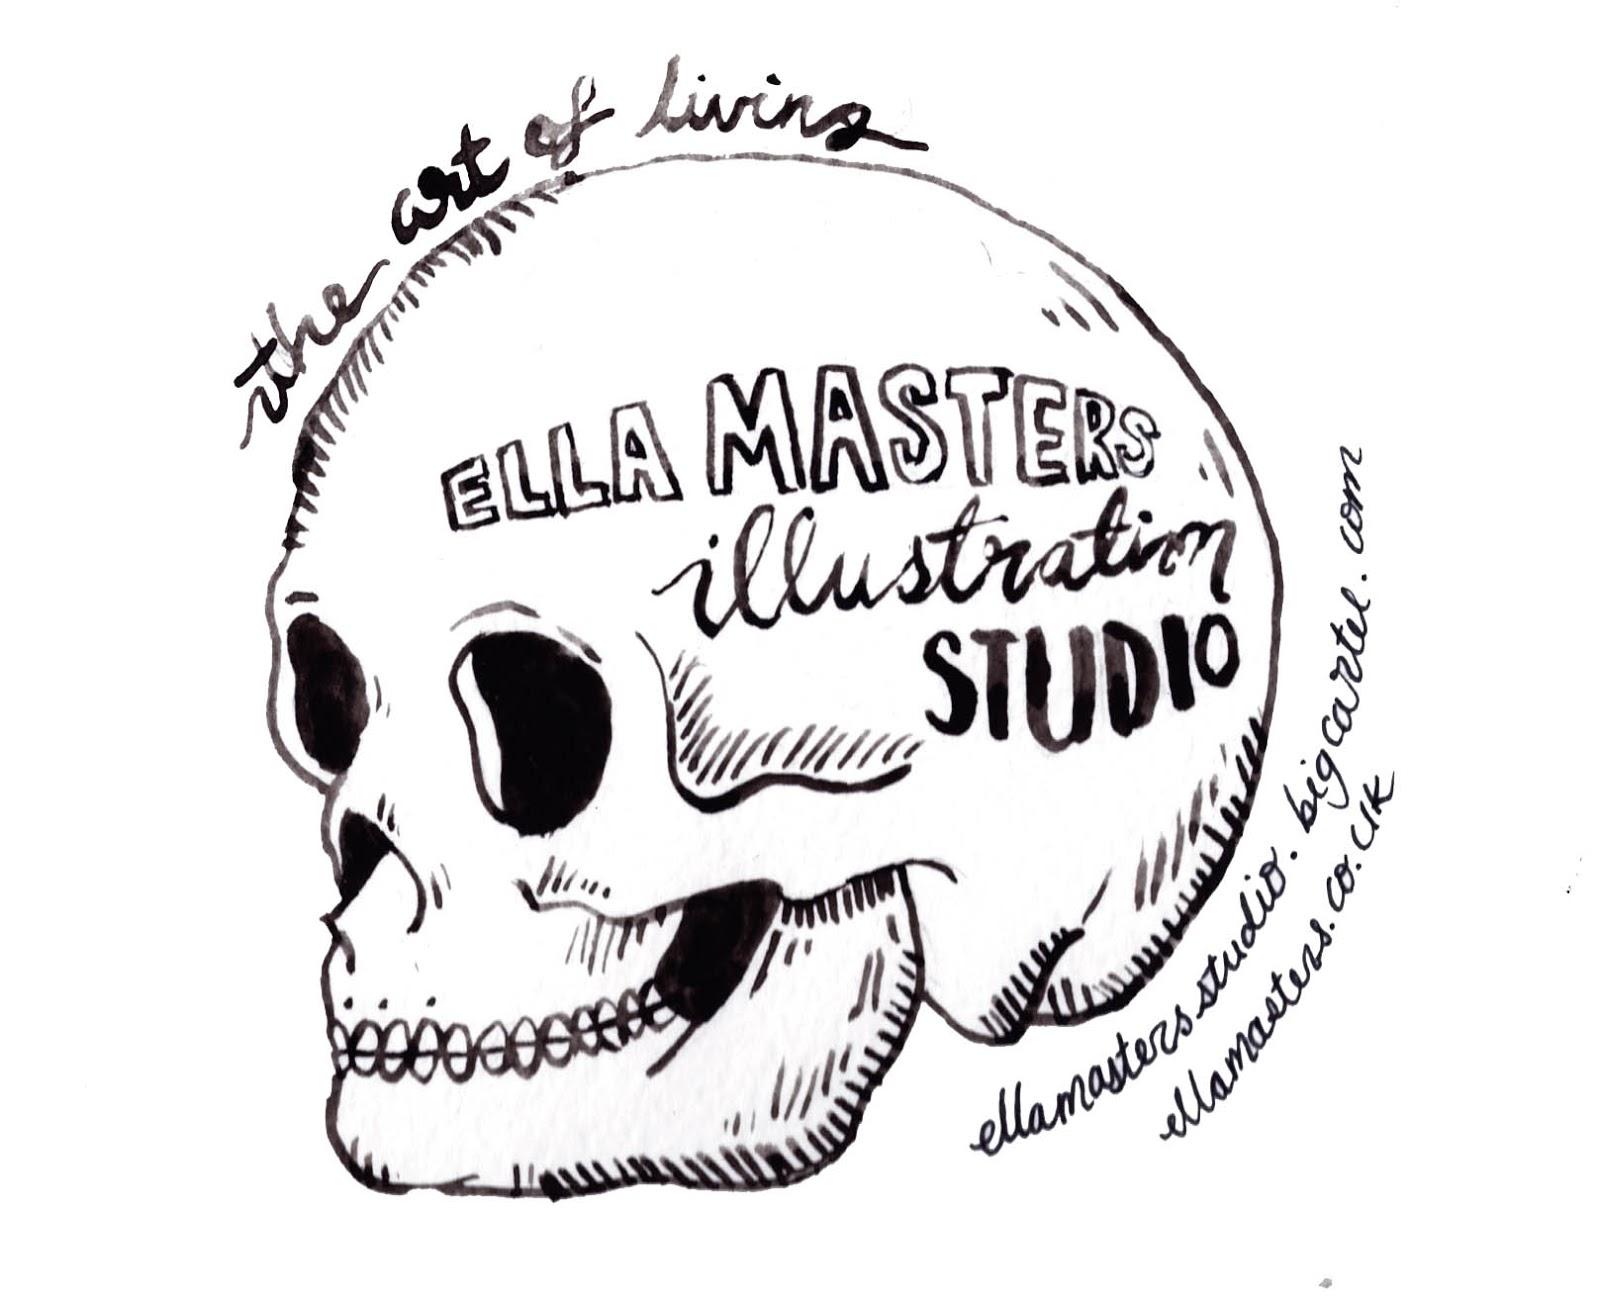 http://ellamastersstudio.bigcartel.com/